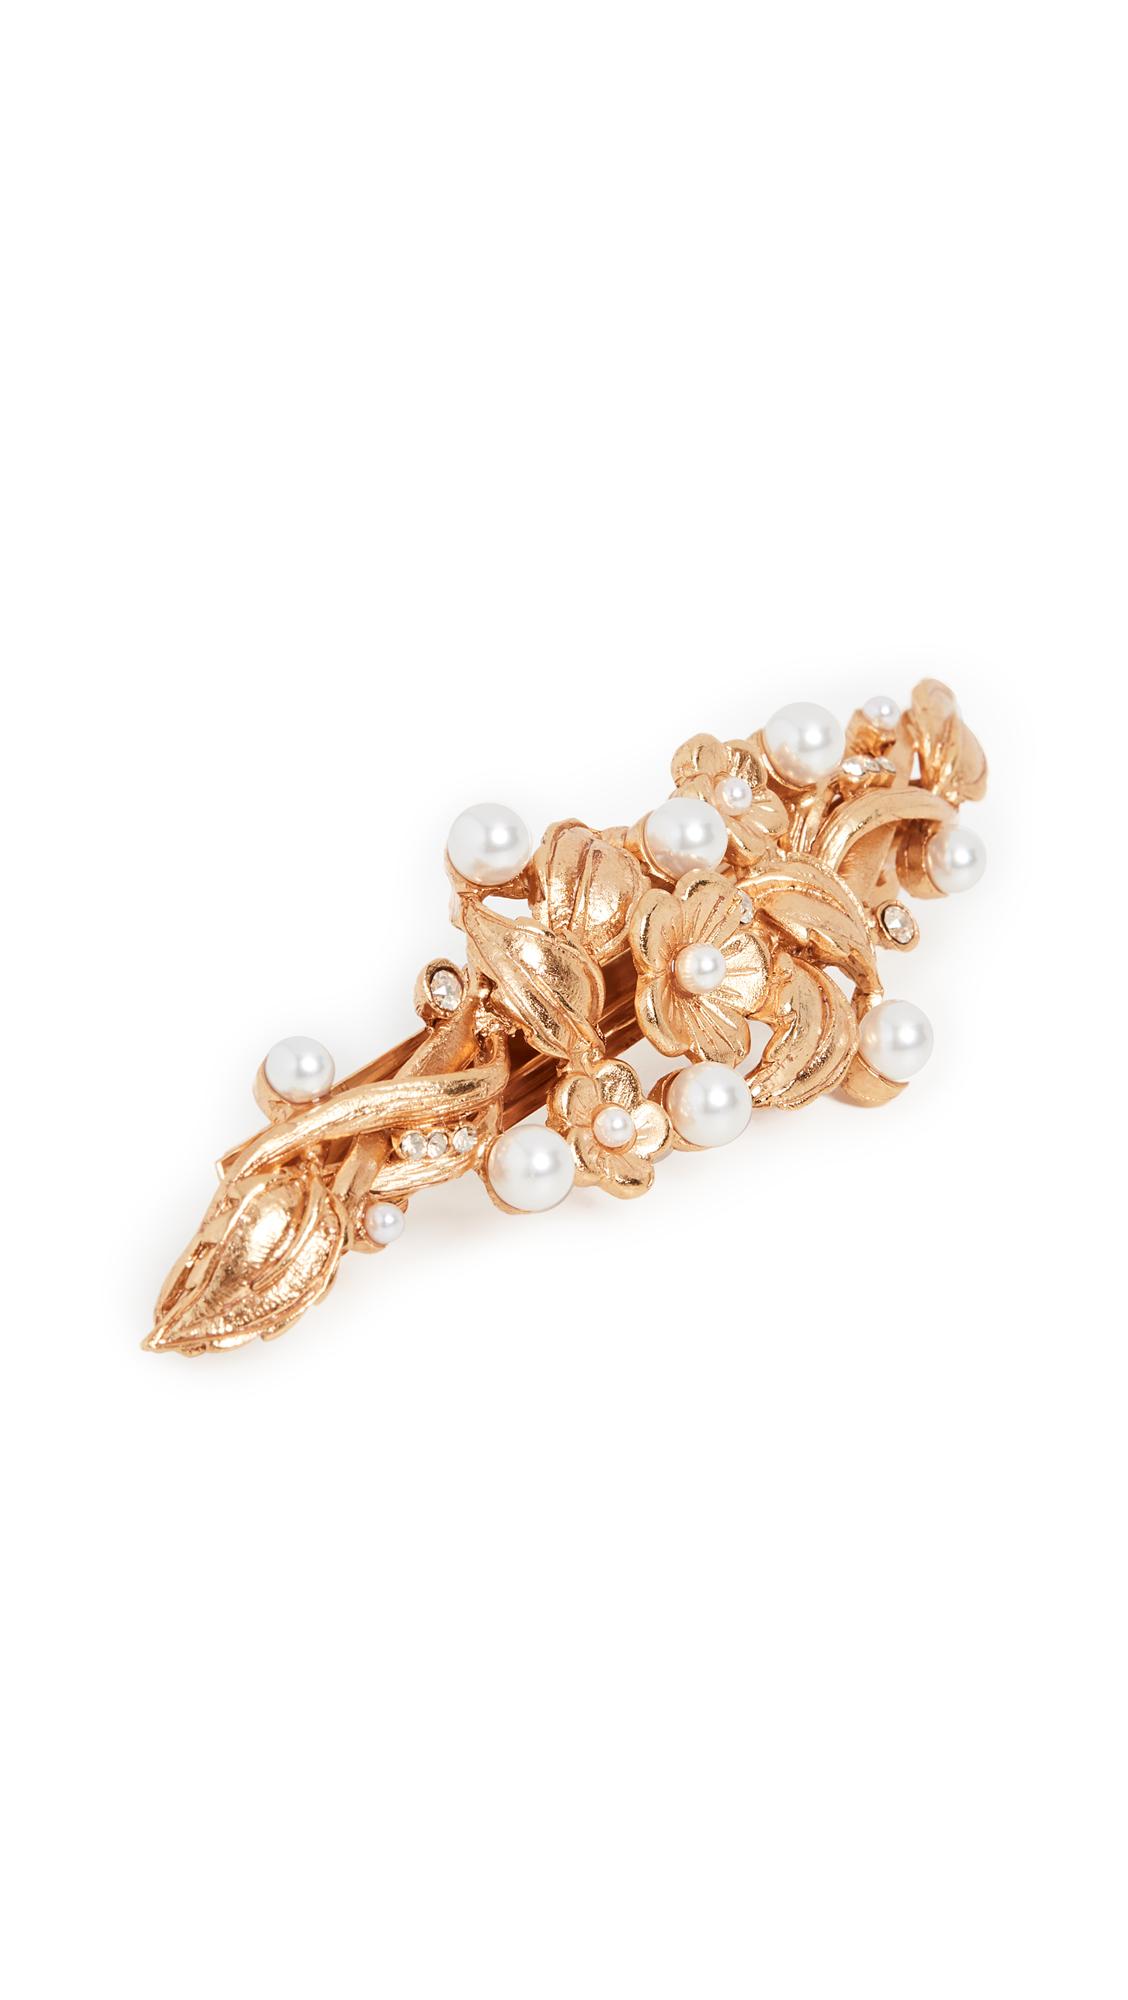 Oscar De La Renta Painted Flower & Imitation Pearl Hair Clip In Gold